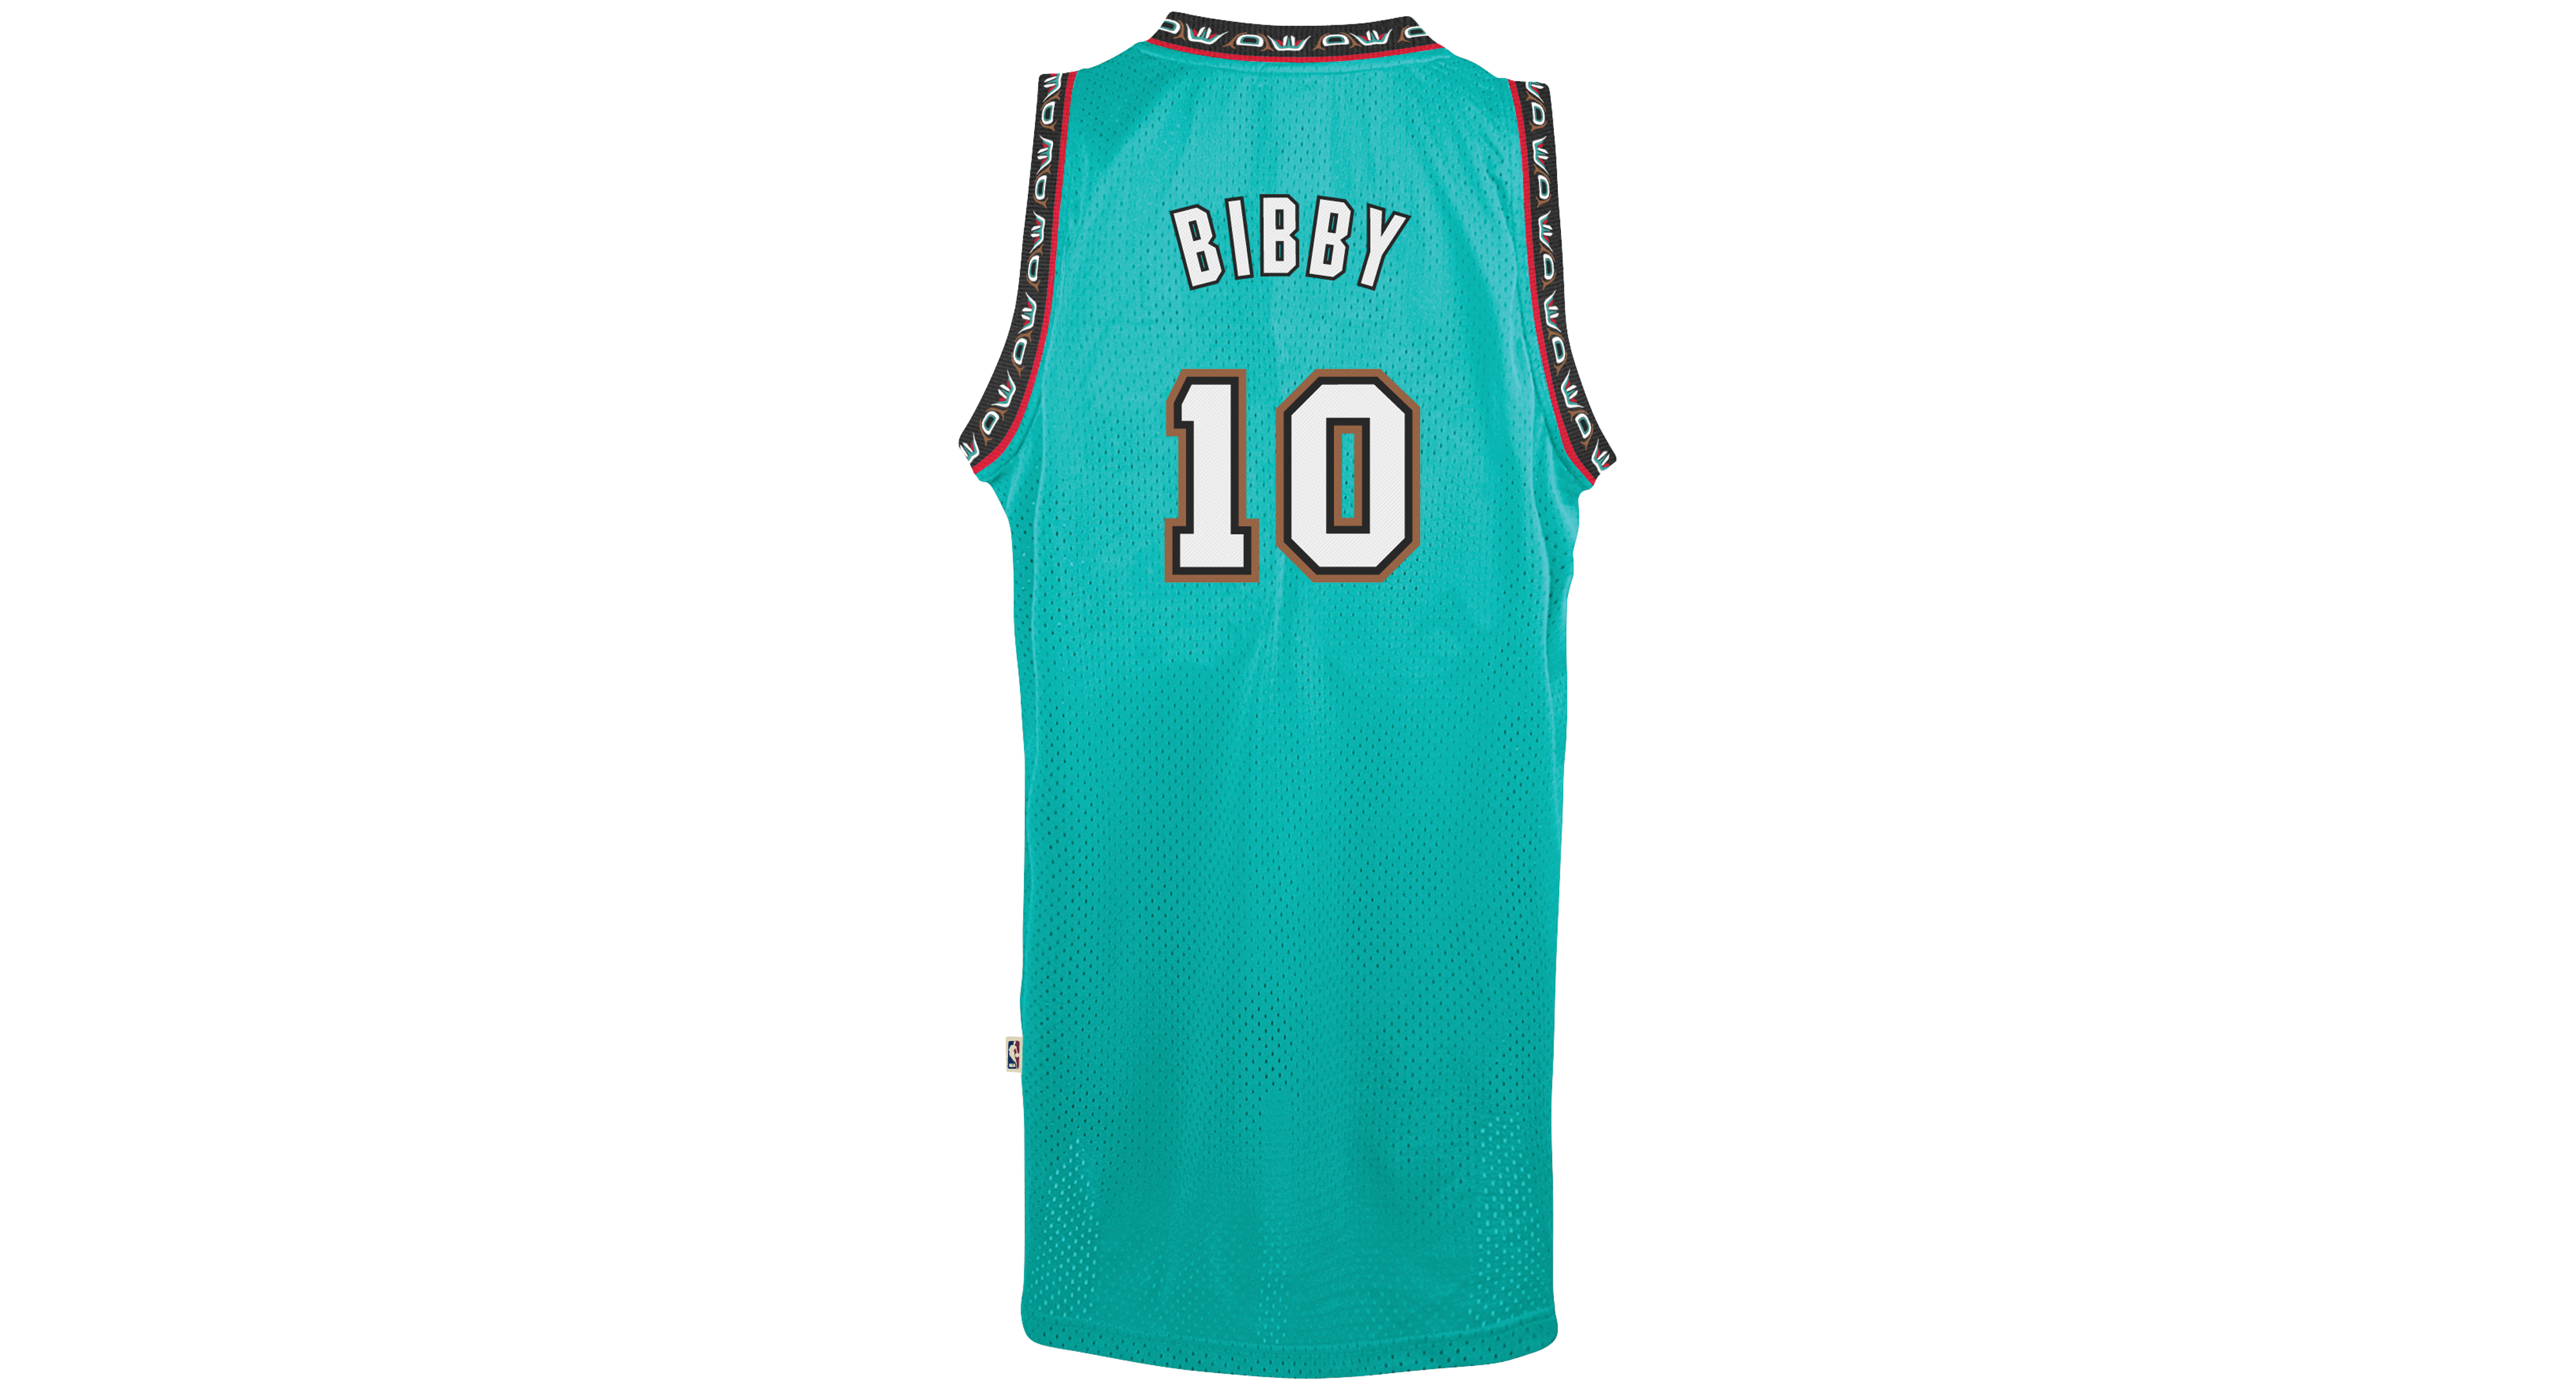 7b663fbad Men's Mike Bibby Vancouver Grizzlies Swingman Jersey   Products ...